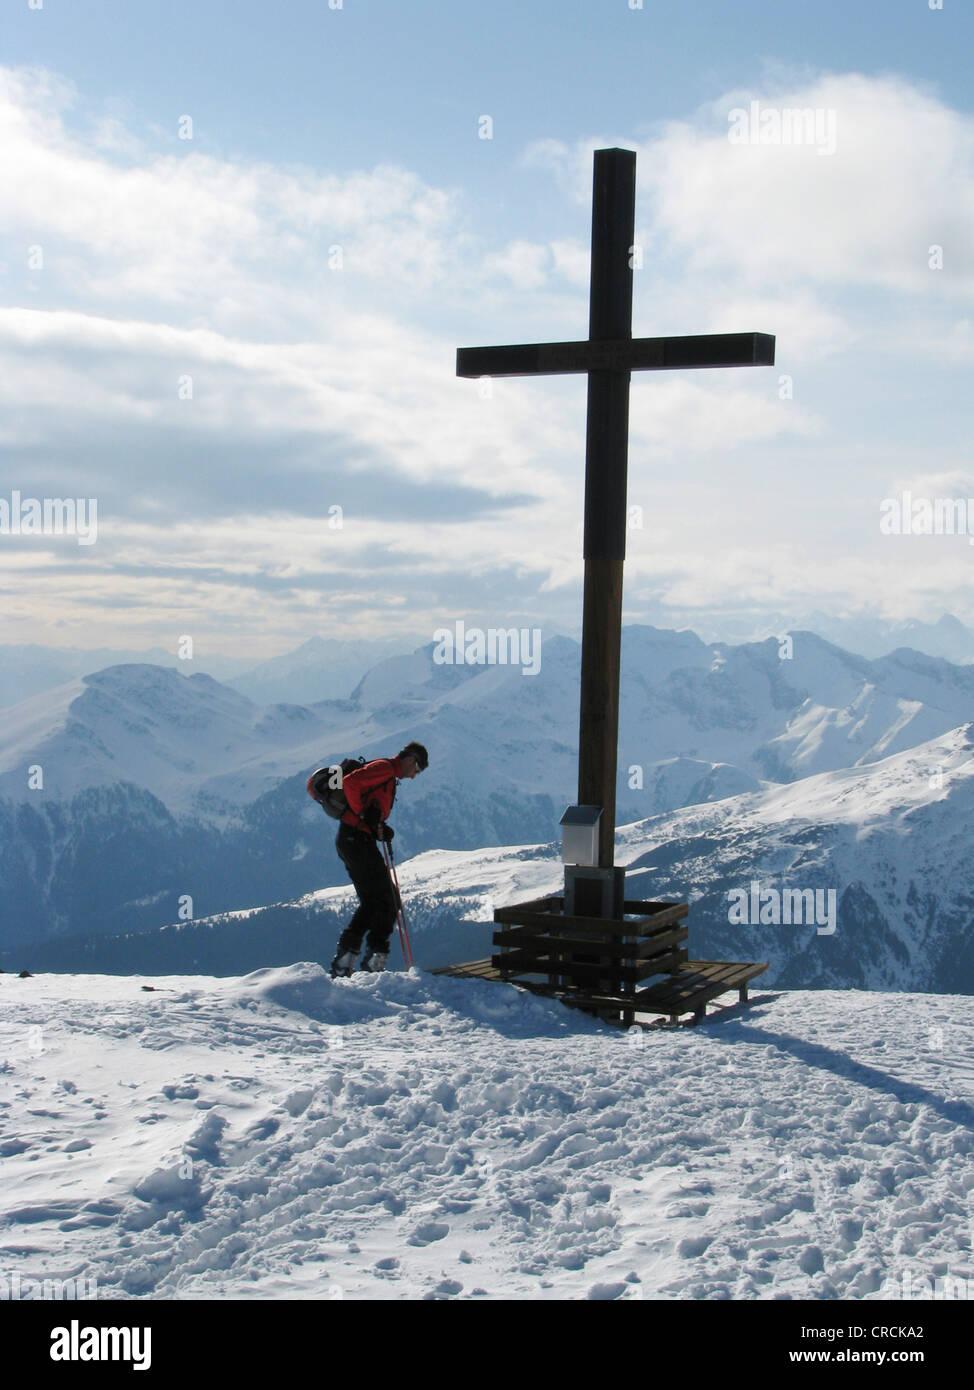 Cross on peak of mountain in snowy mountain scenery - mountain climber with touring ski has reached the mountain - Stock Image